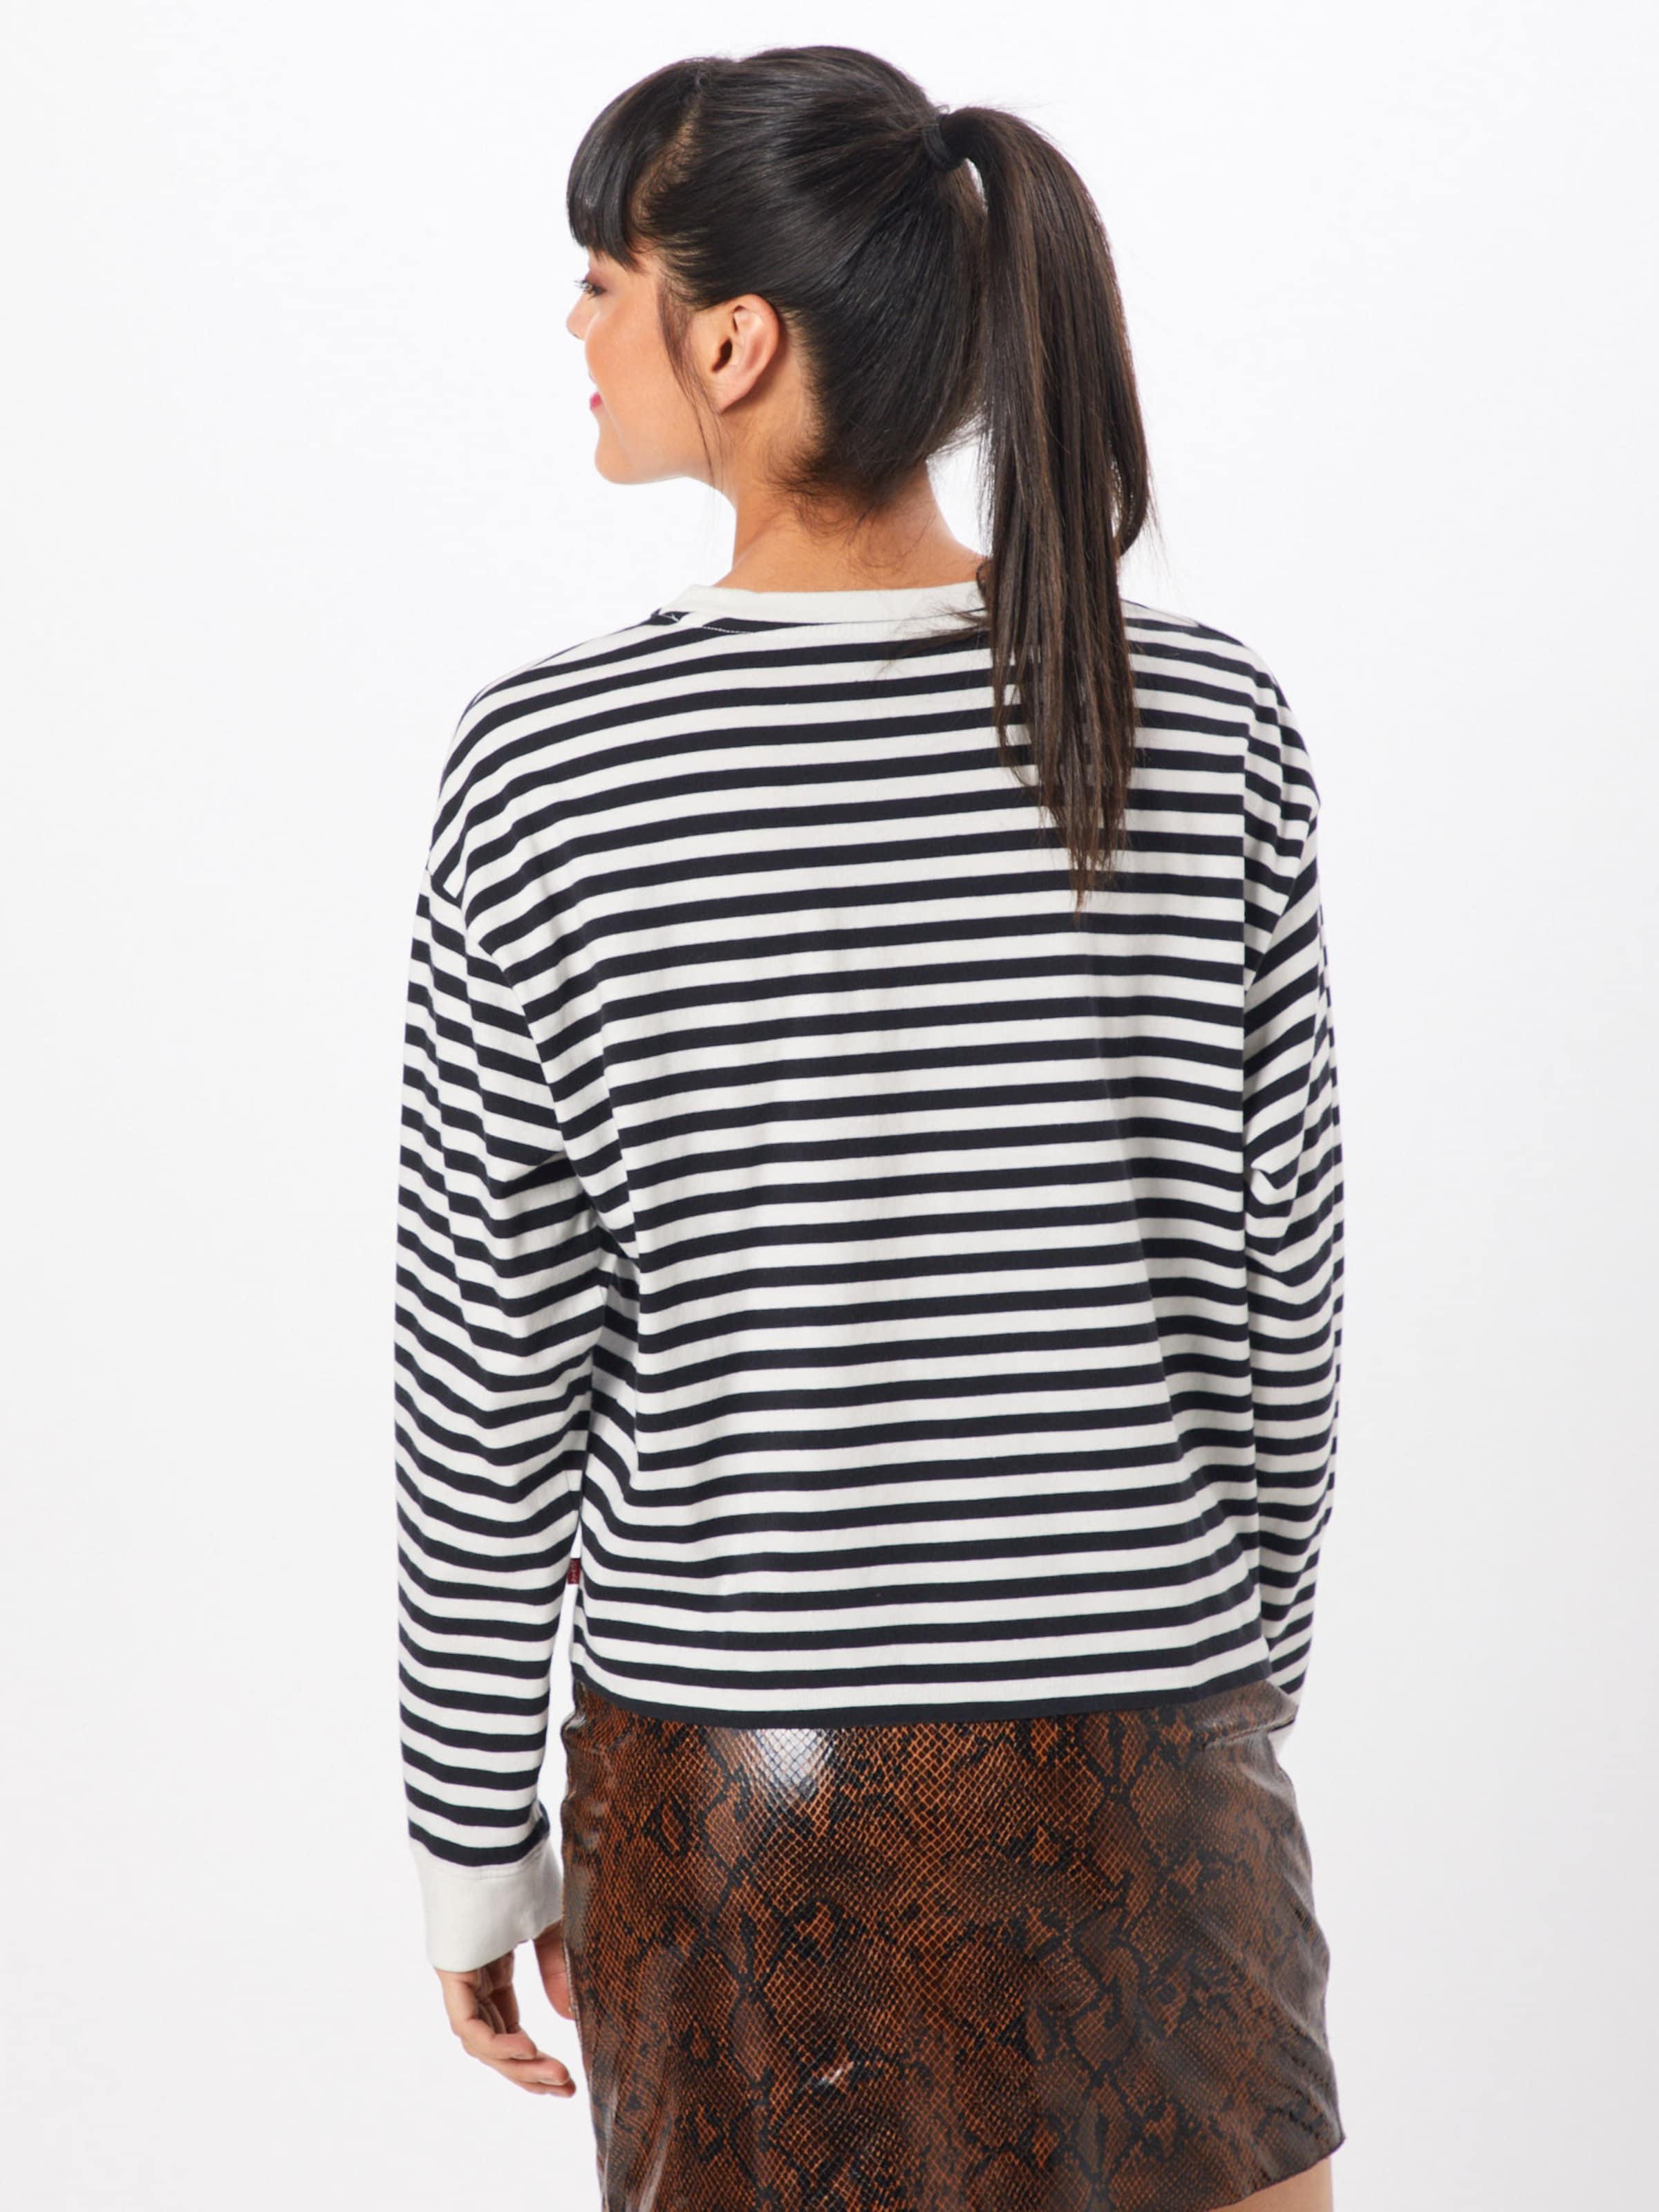 Tee' 'graphic T NoirBlanc Long shirt Sleeve En Levi's vmn80wN